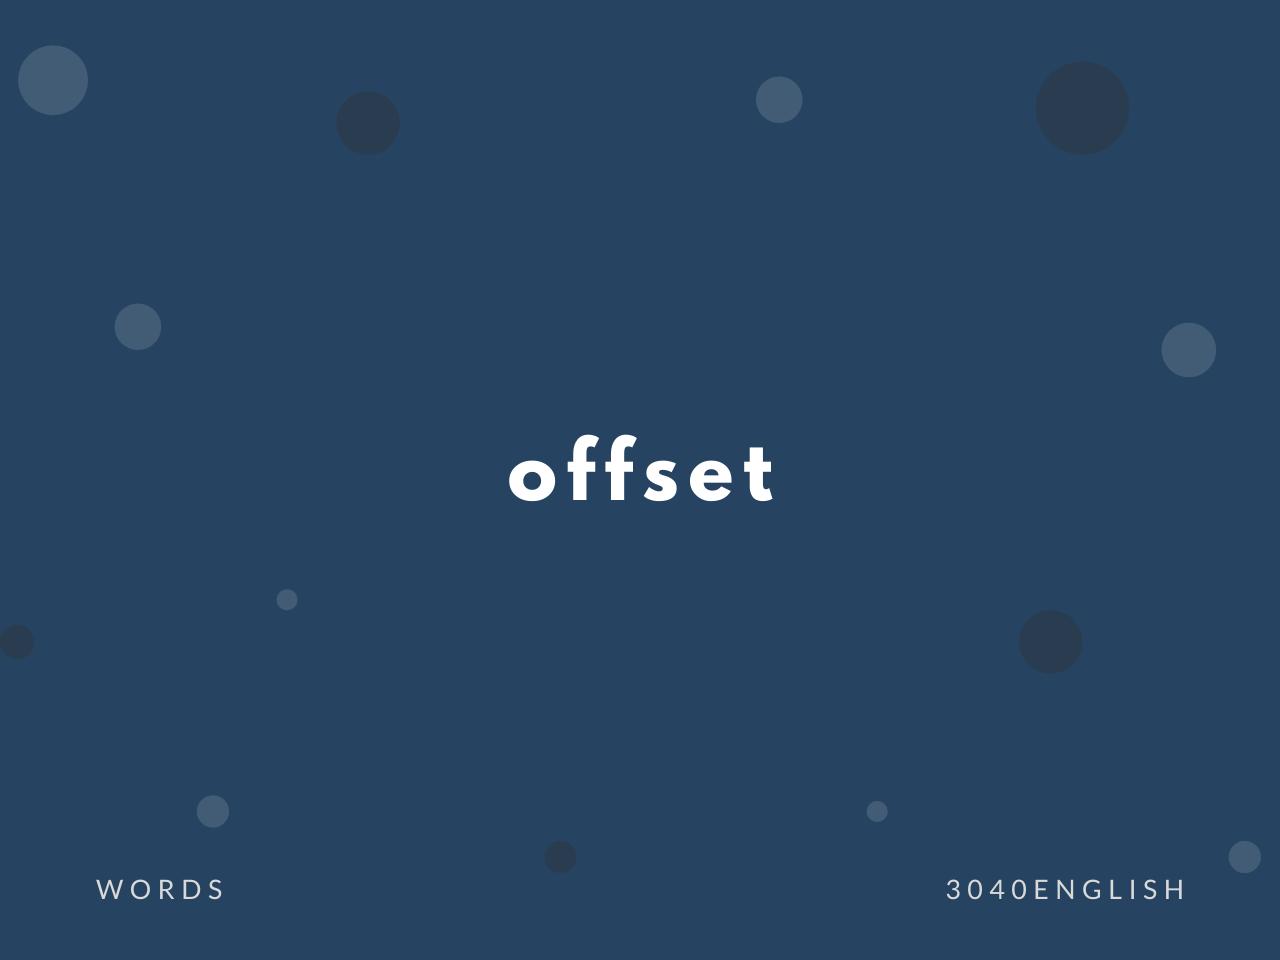 offset の意味と簡単な使い方【音読用例文あり】